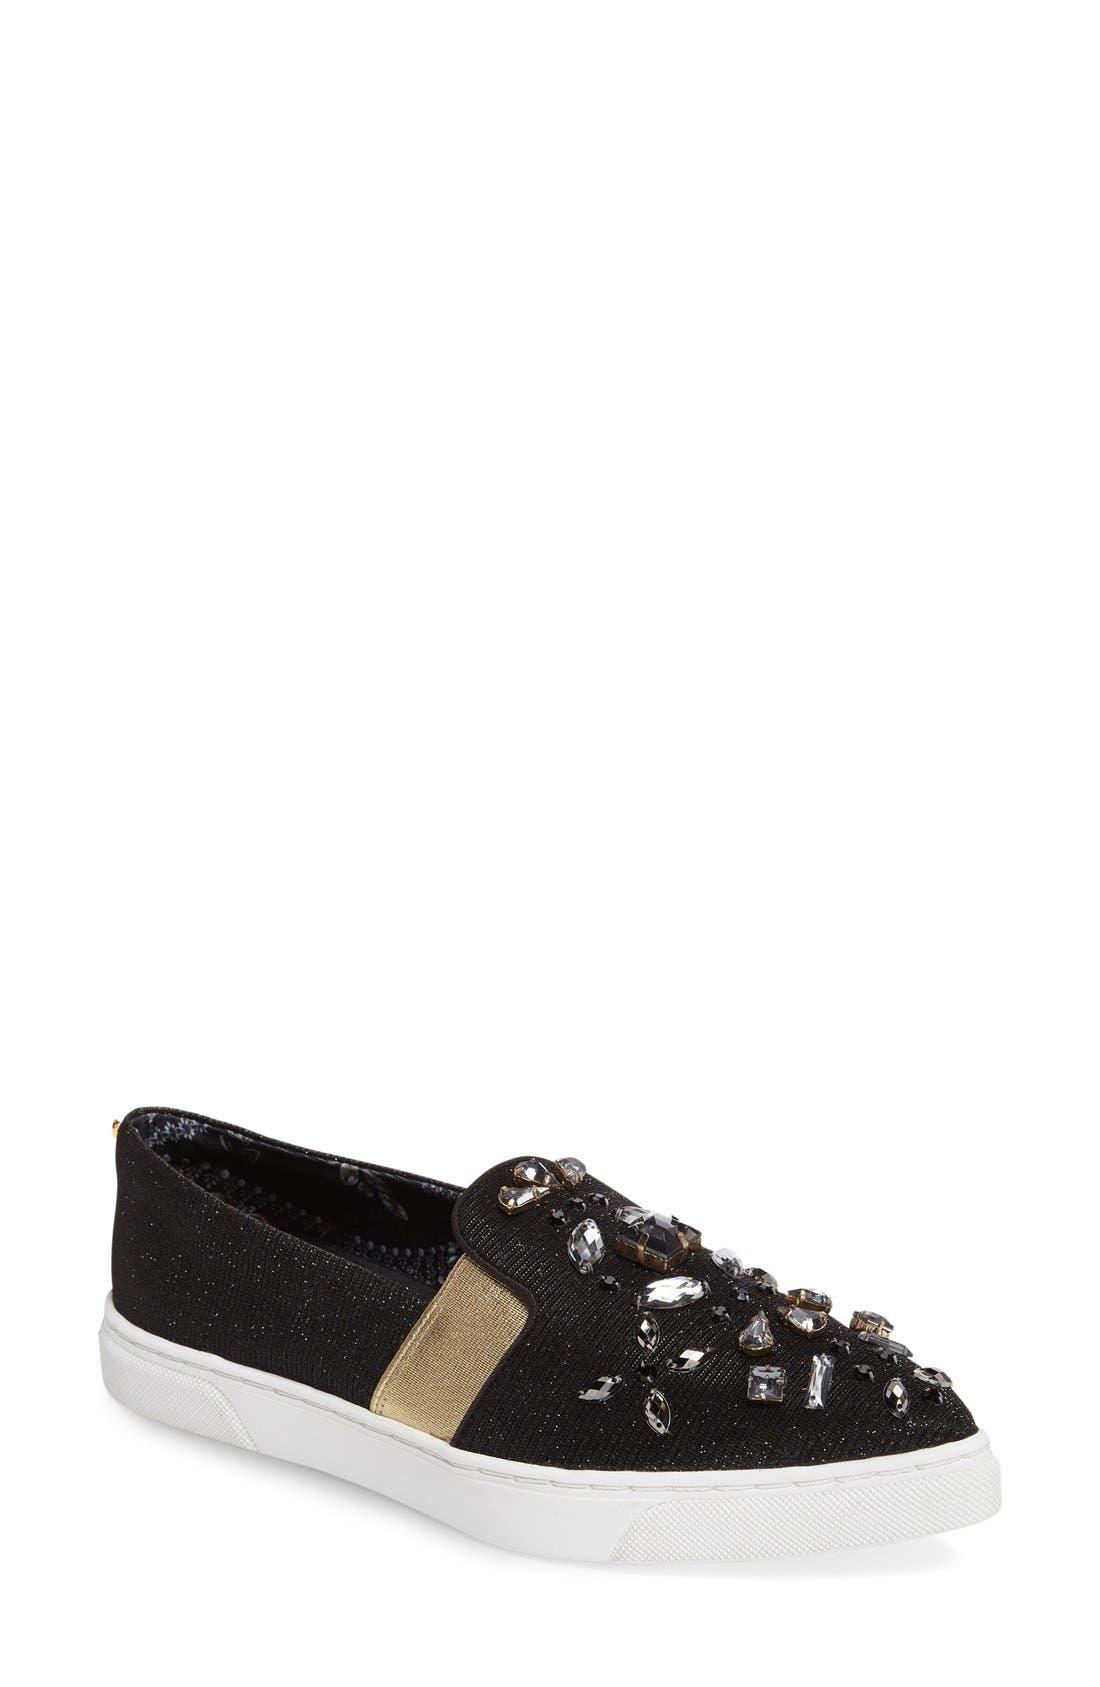 Alternate Image 1 Selected - Ted Baker London 'Thfia' Floral Pointy Toe Slip-On Sneaker (Women)